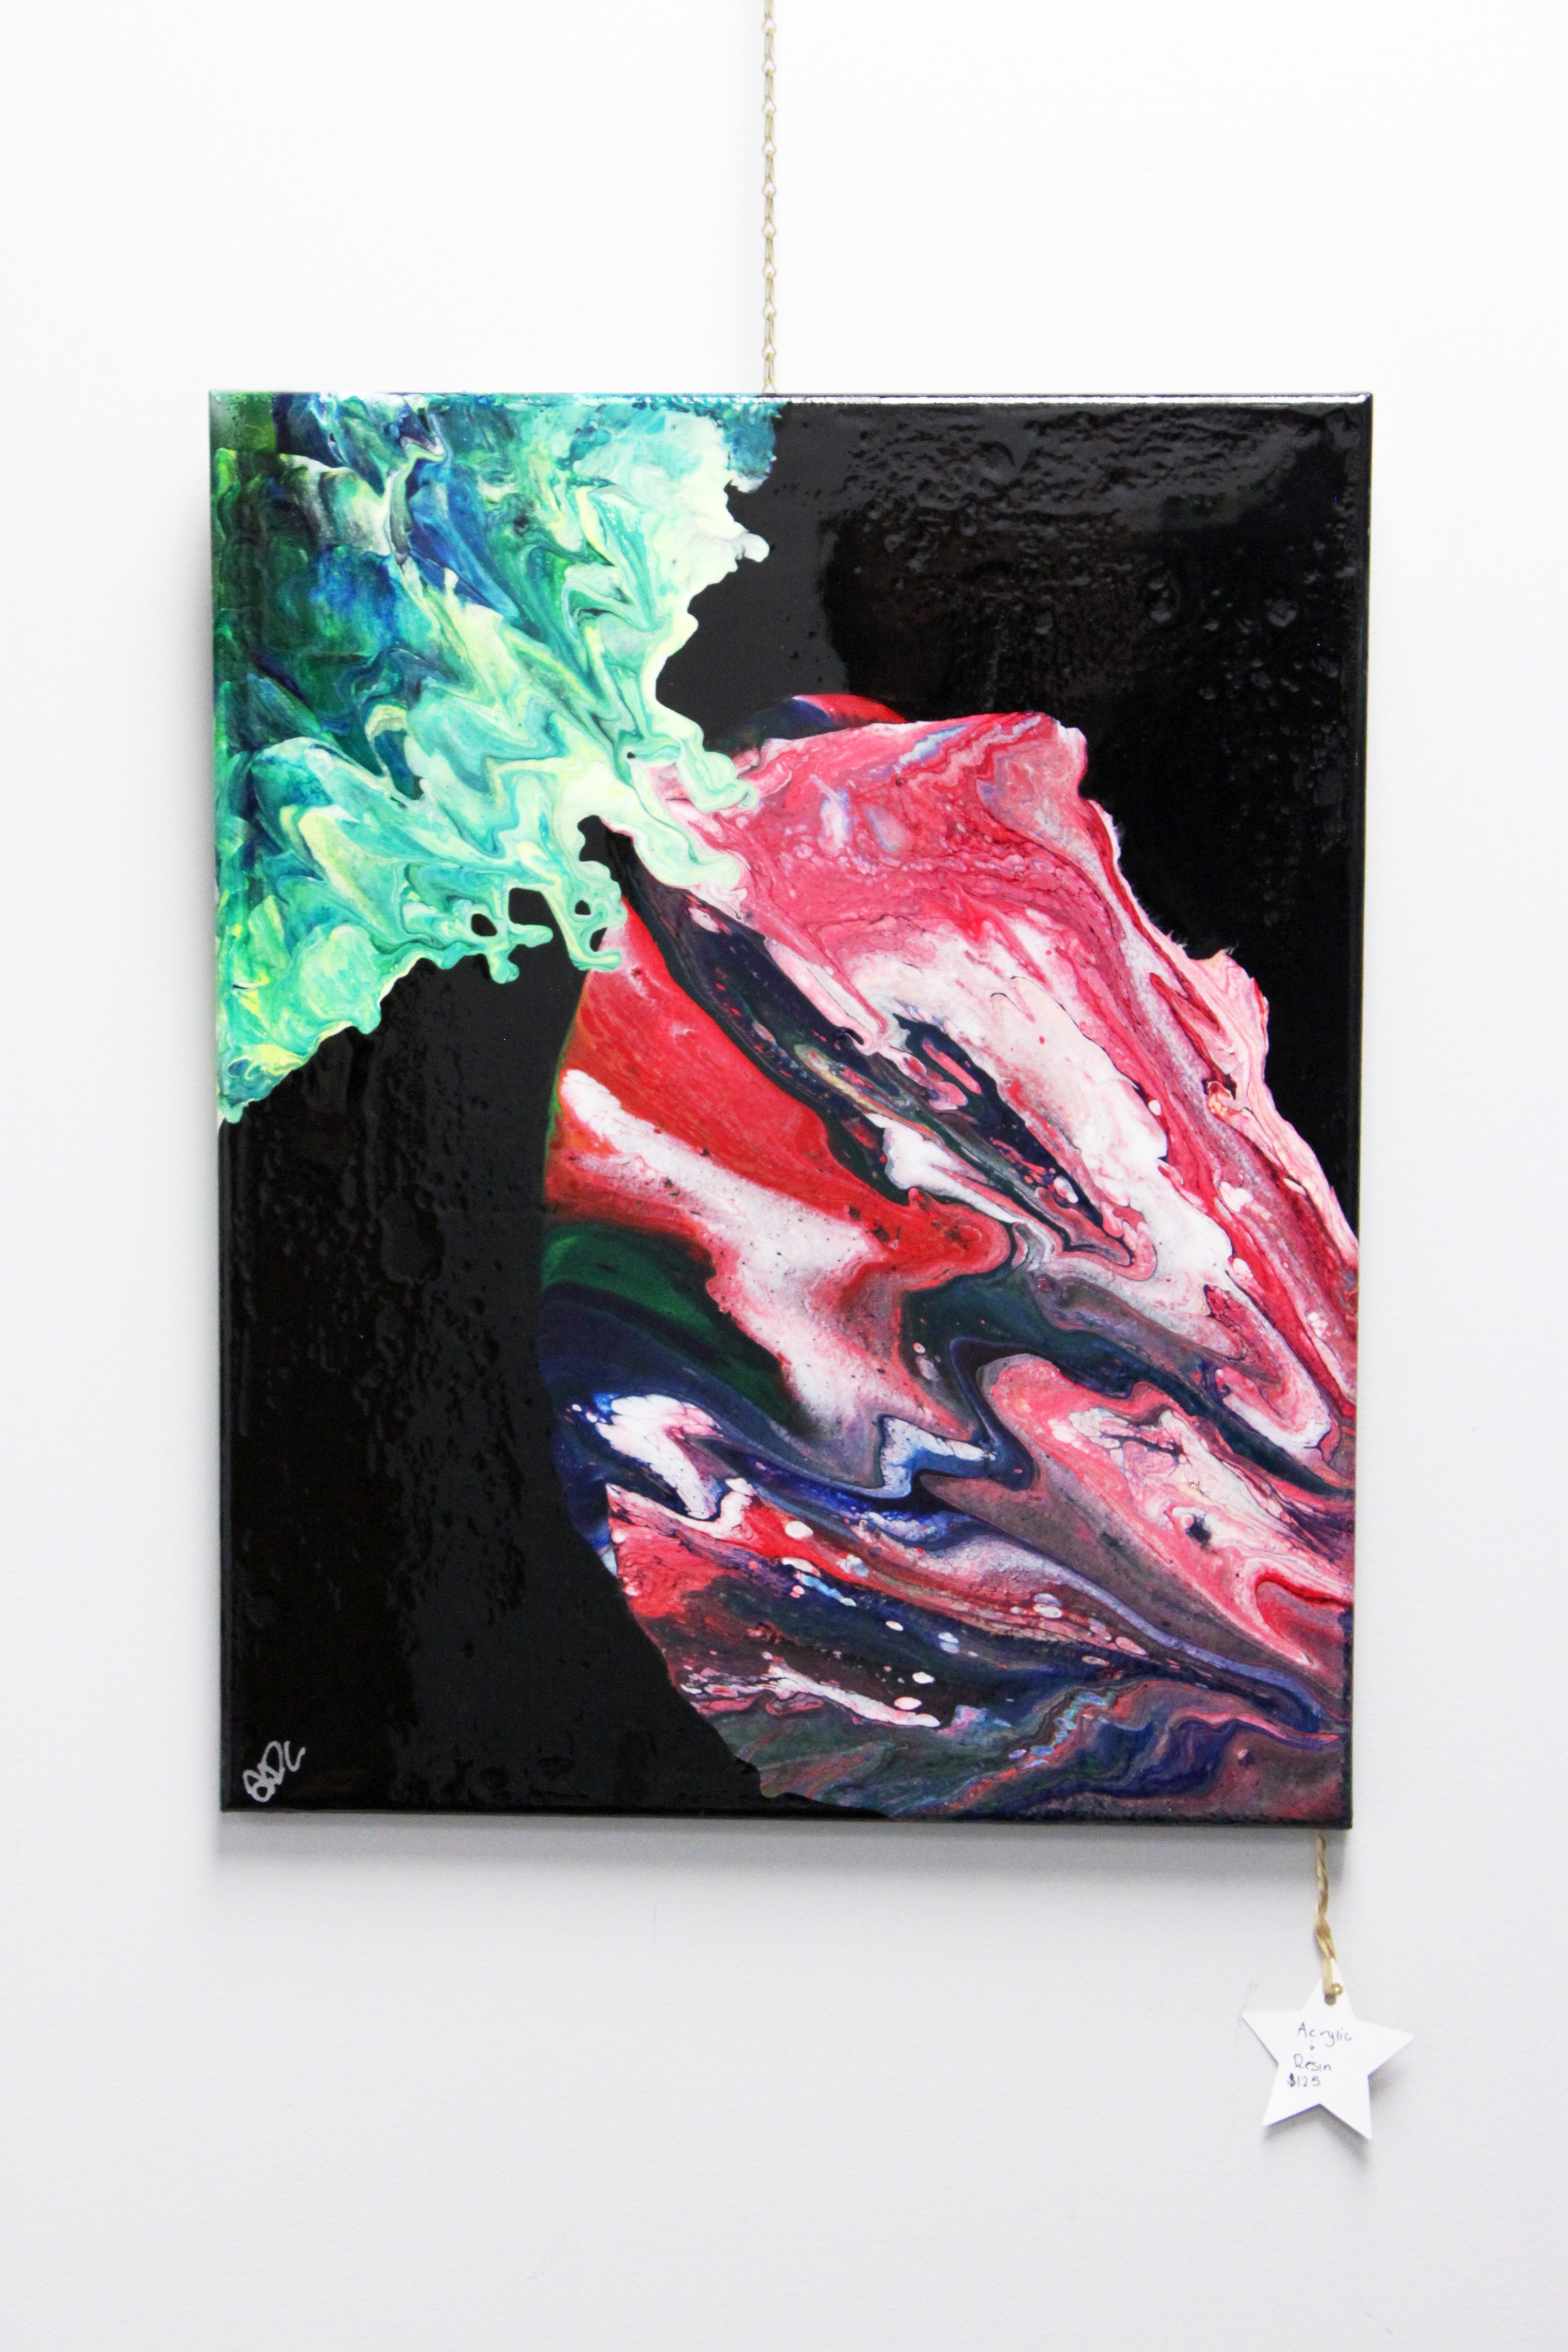 Acrylic & resin painting by Alisha Colgan